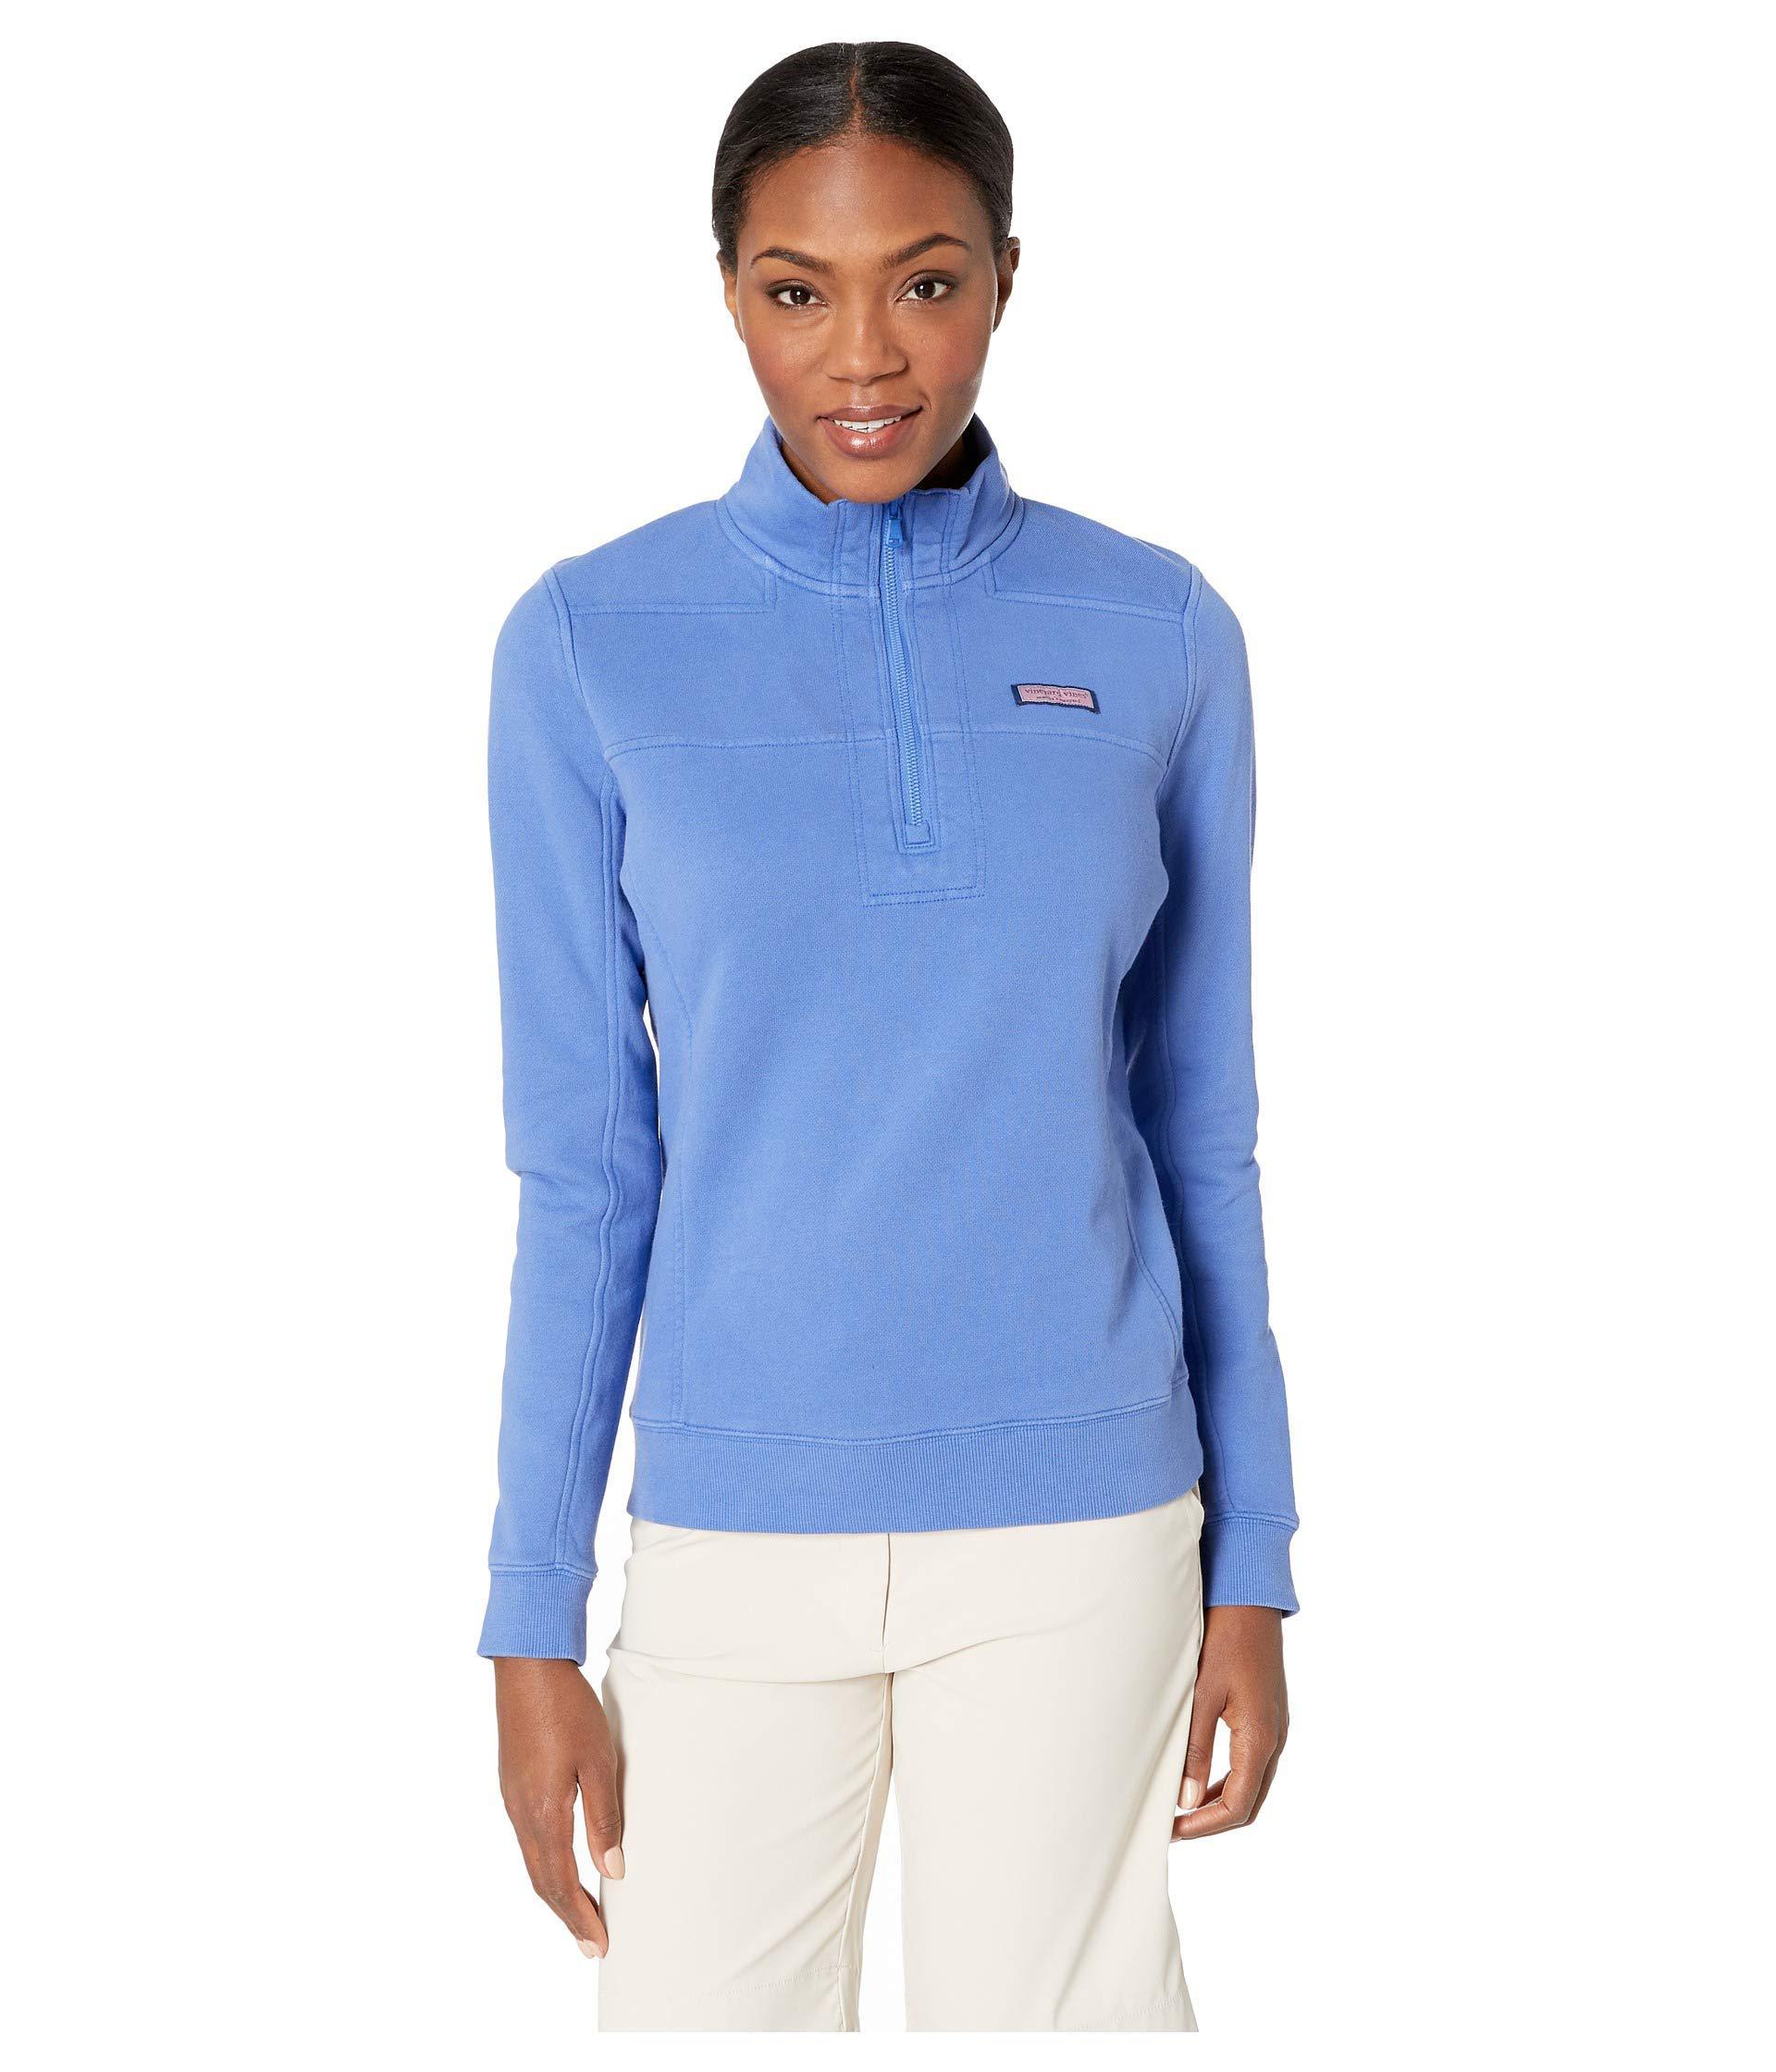 d44ab28ca4fb7 Lyst - Vineyard Vines Garment Dyed Shep Pullover (marlin) Women s ...